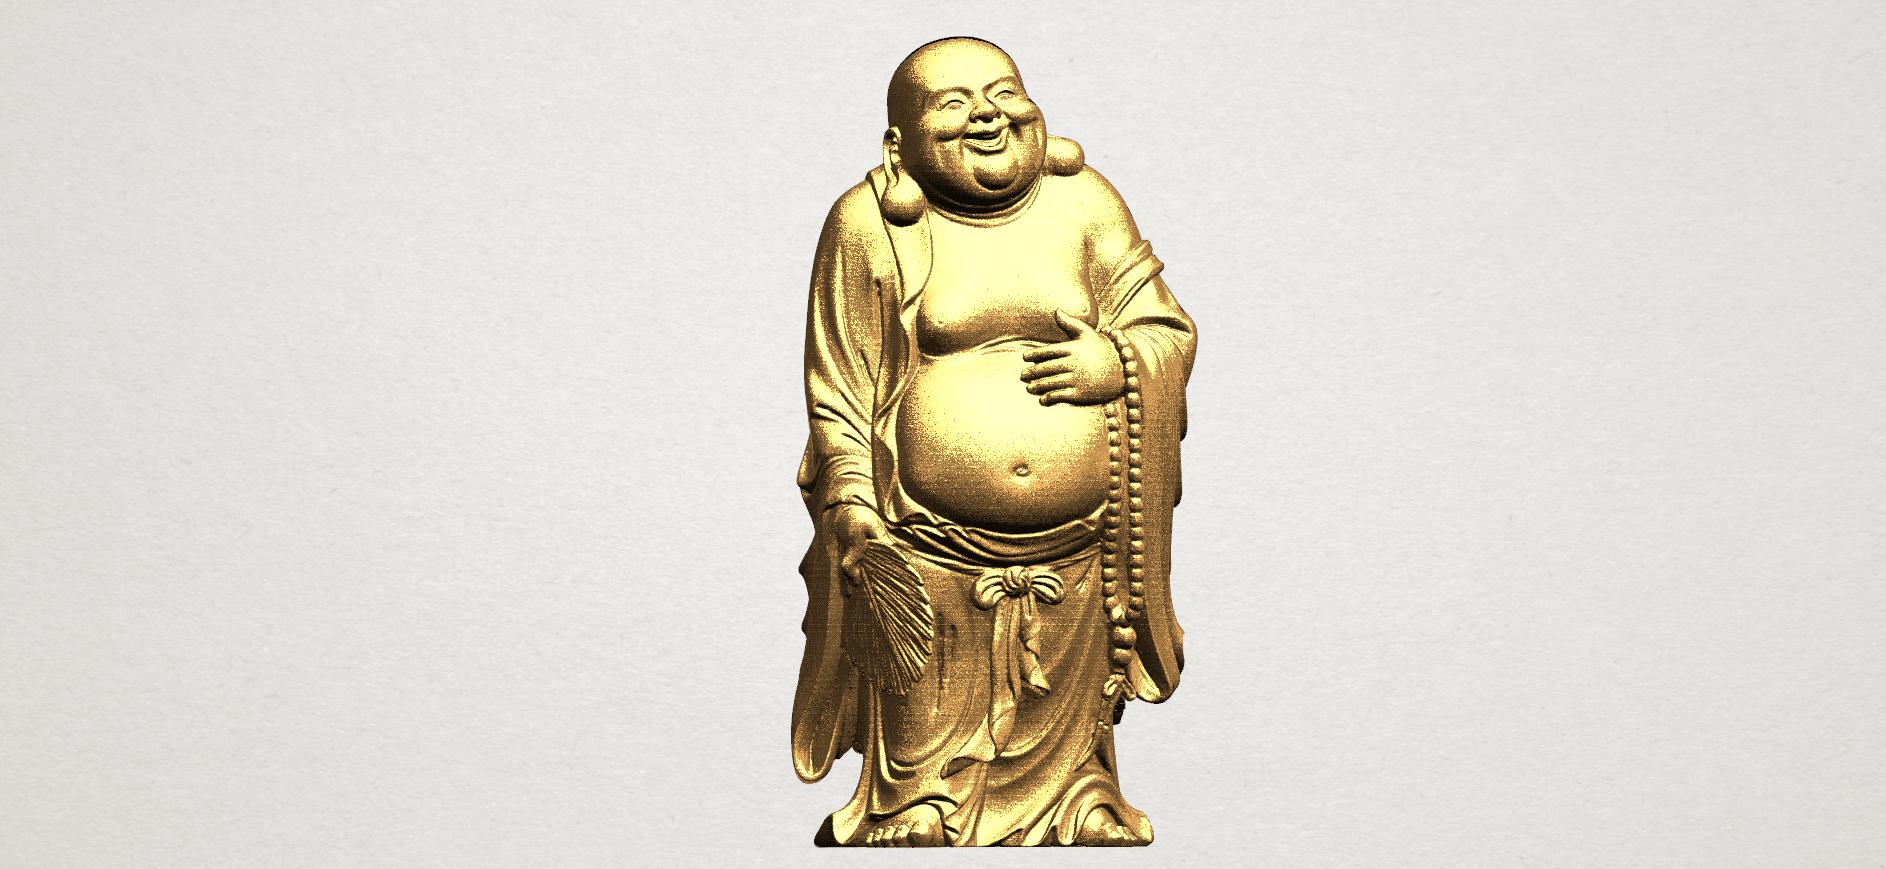 TDA0070 Metteyya Buddha 01 - 88mm - A01.png Download free STL file Metteyya Buddha 01 • 3D print object, GeorgesNikkei